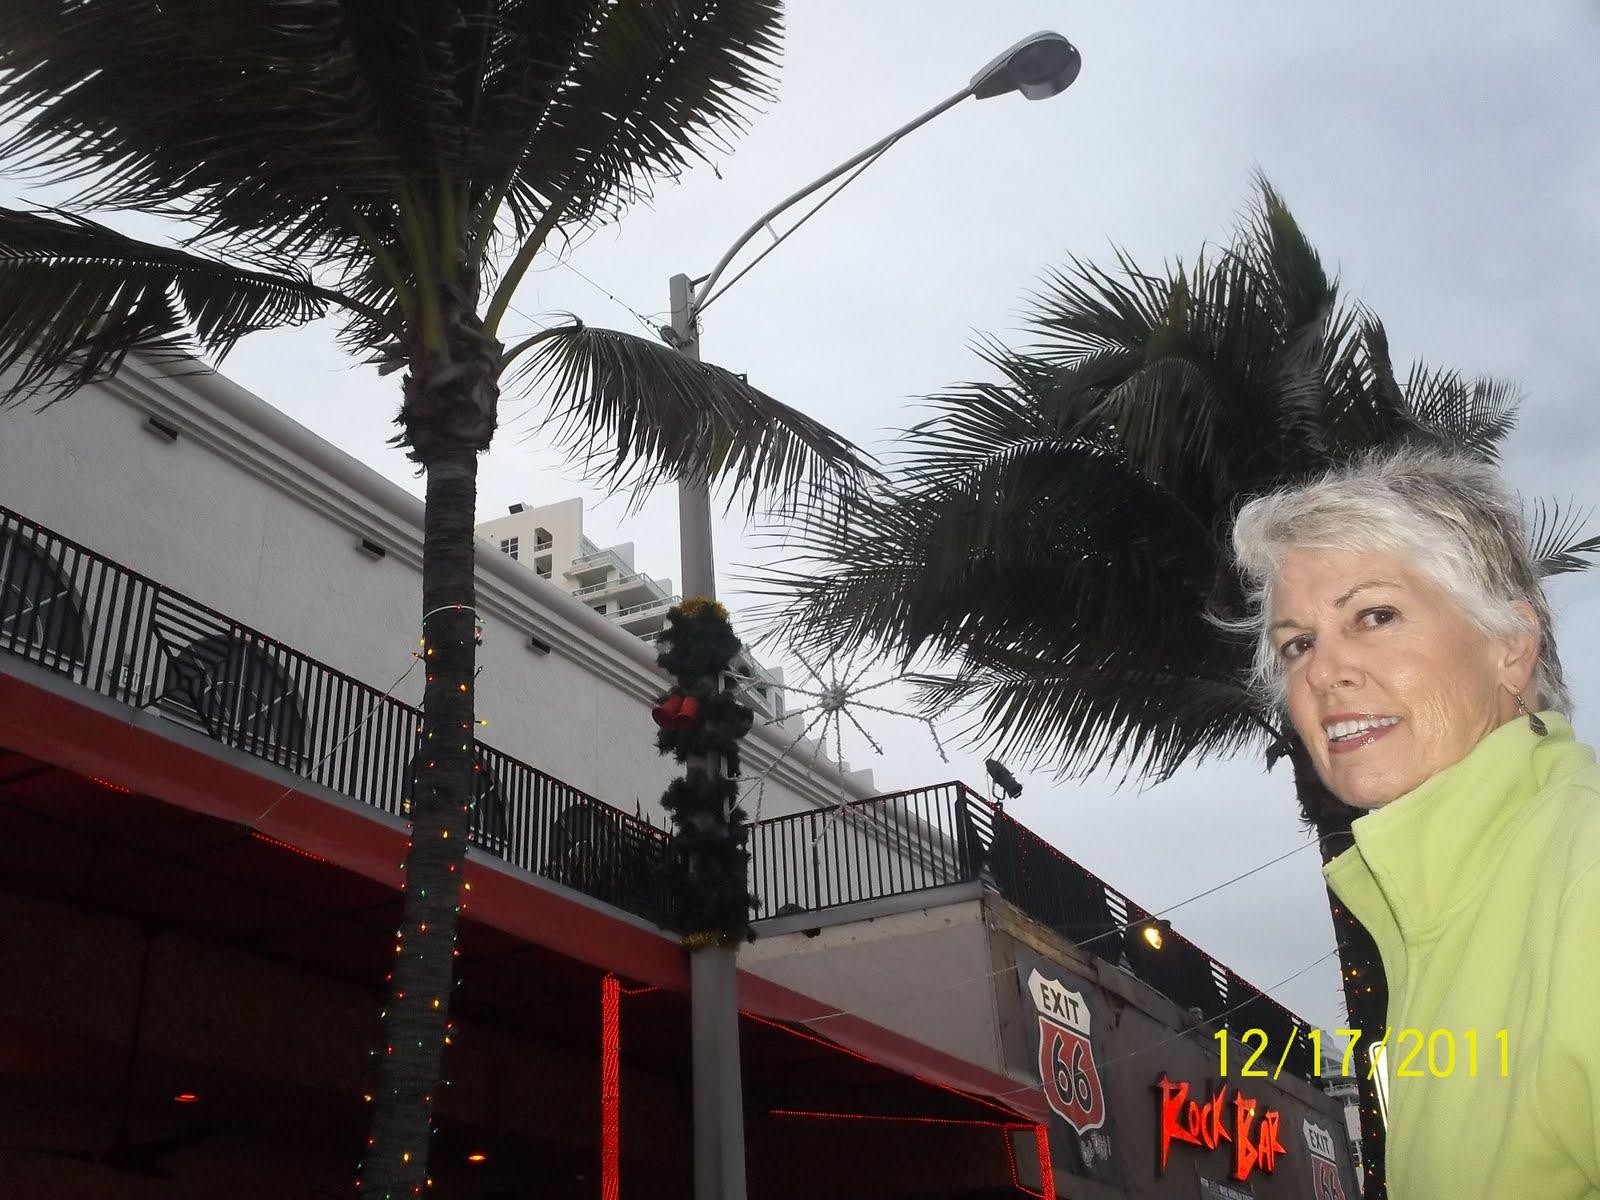 Caribbean Soul: Caribbean Soul: Ft. Lauderdale